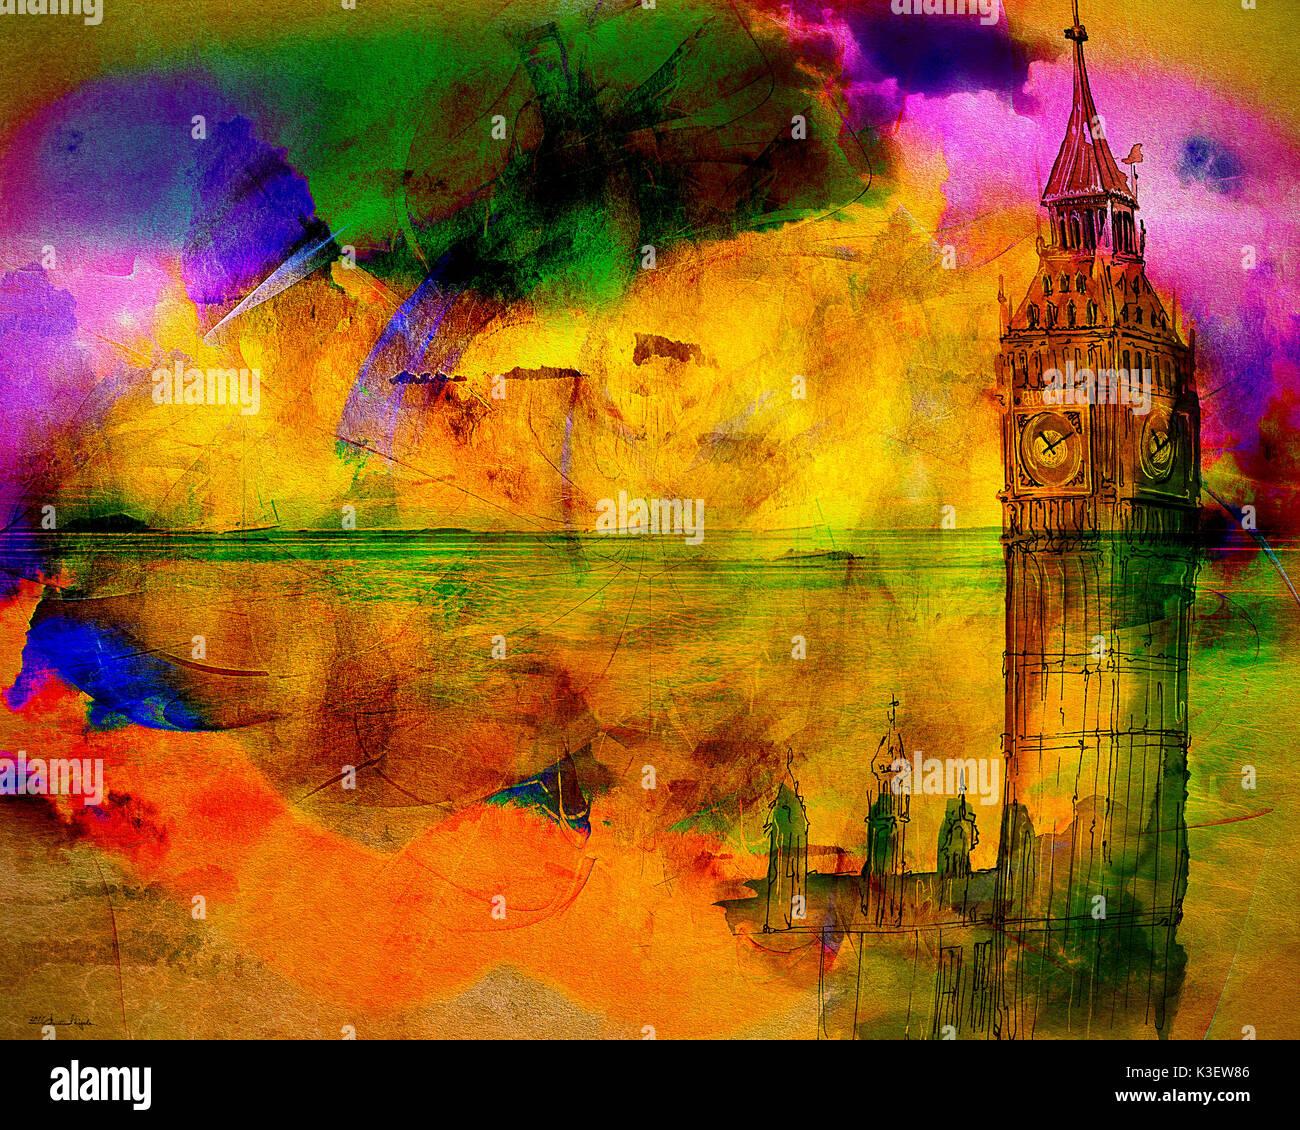 DIGITAL ART: The Westminster Hour - Stock Image